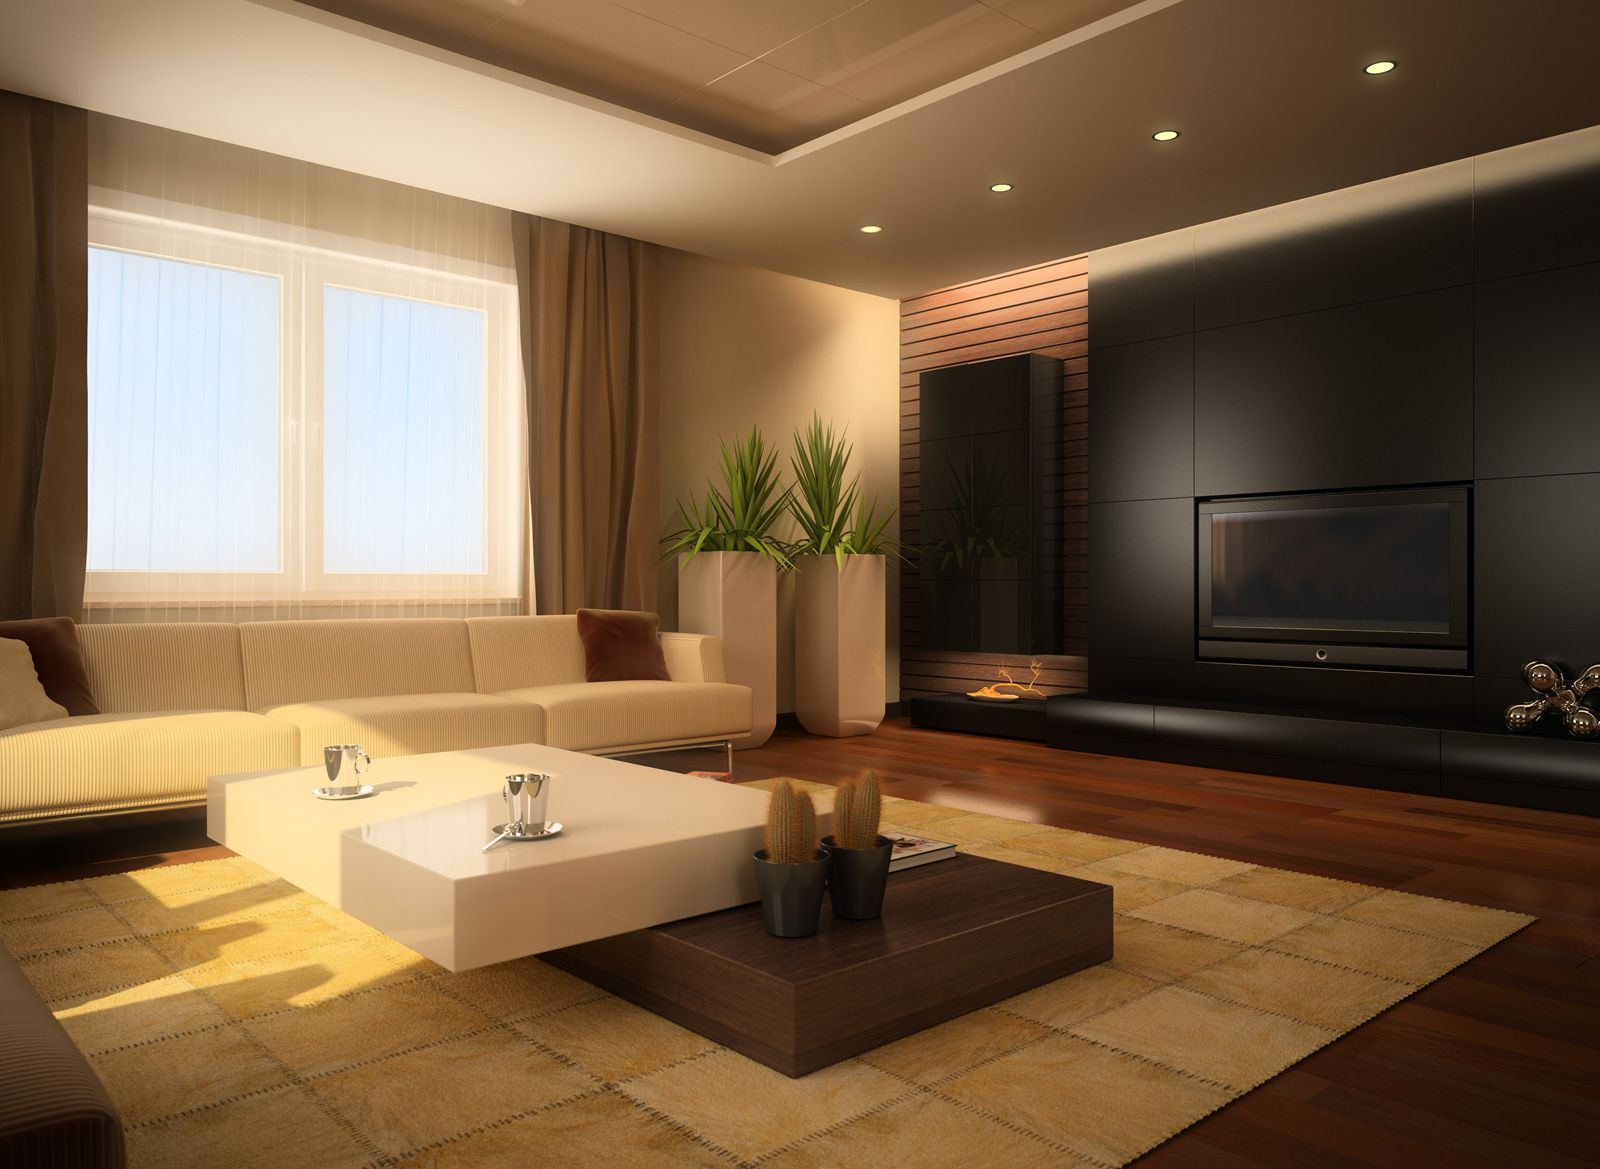 Modern Minimalist Interior Designs For Living Rooms modern interior designs for living rooms